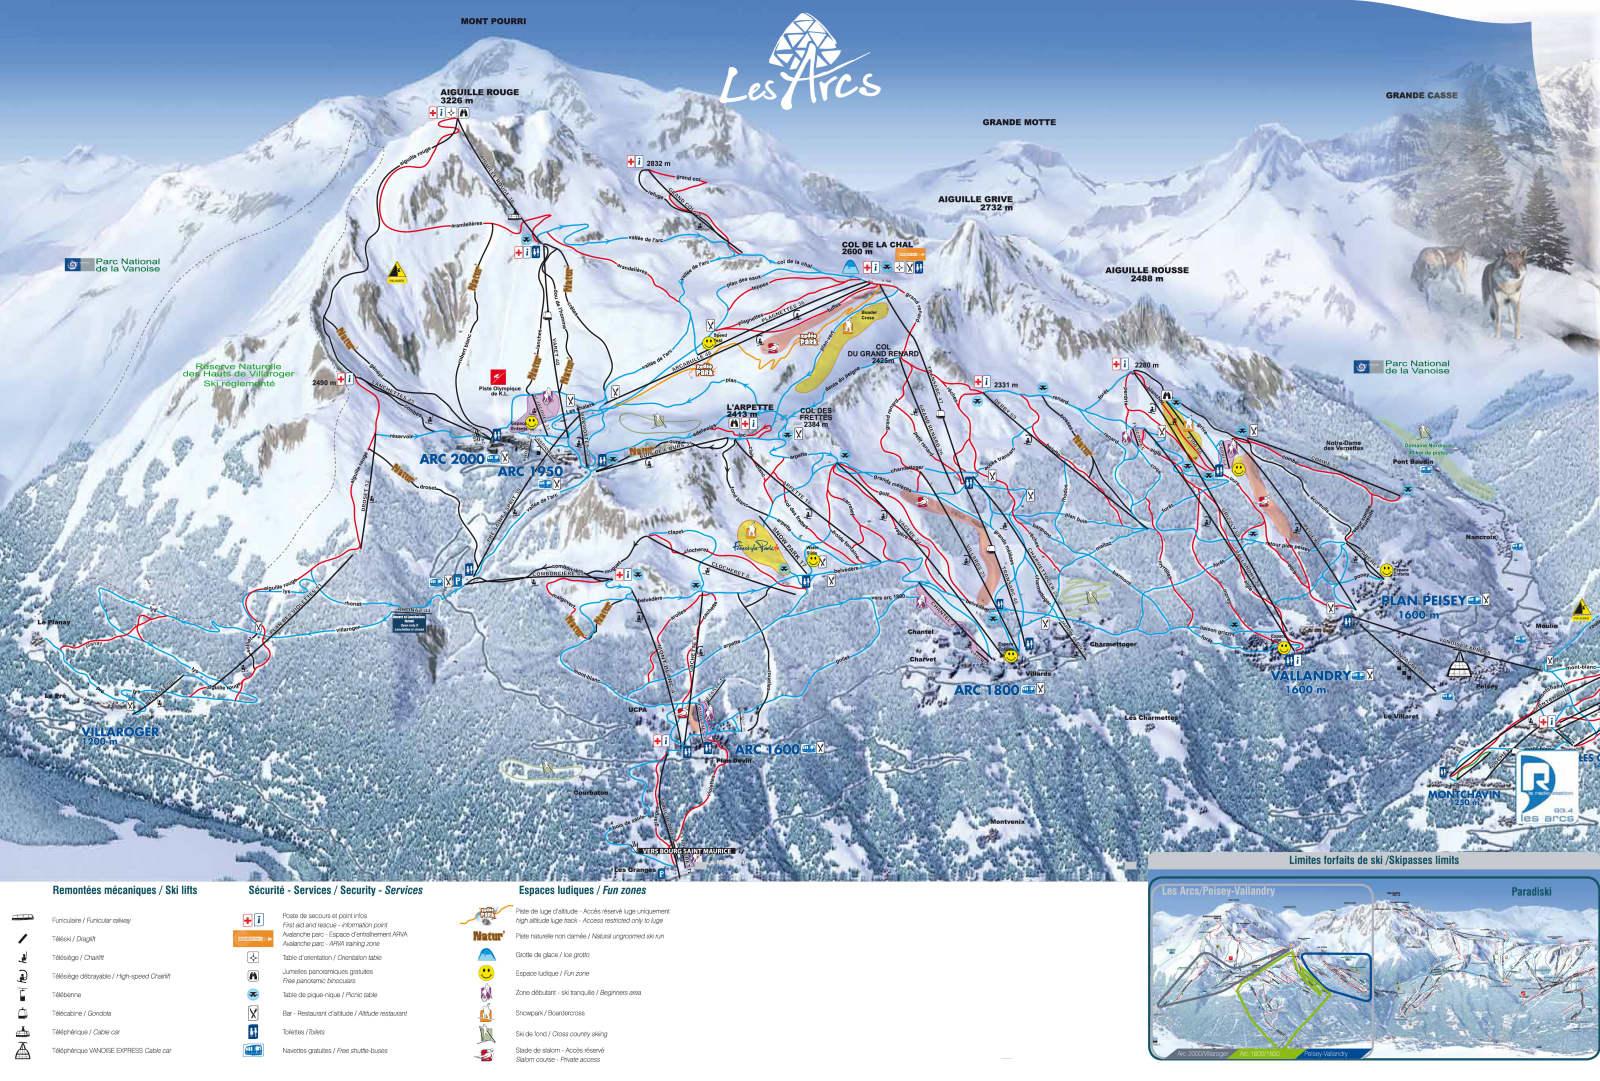 Les Arcs ski holiday catered chalet Les Arcs Les Arcs ski